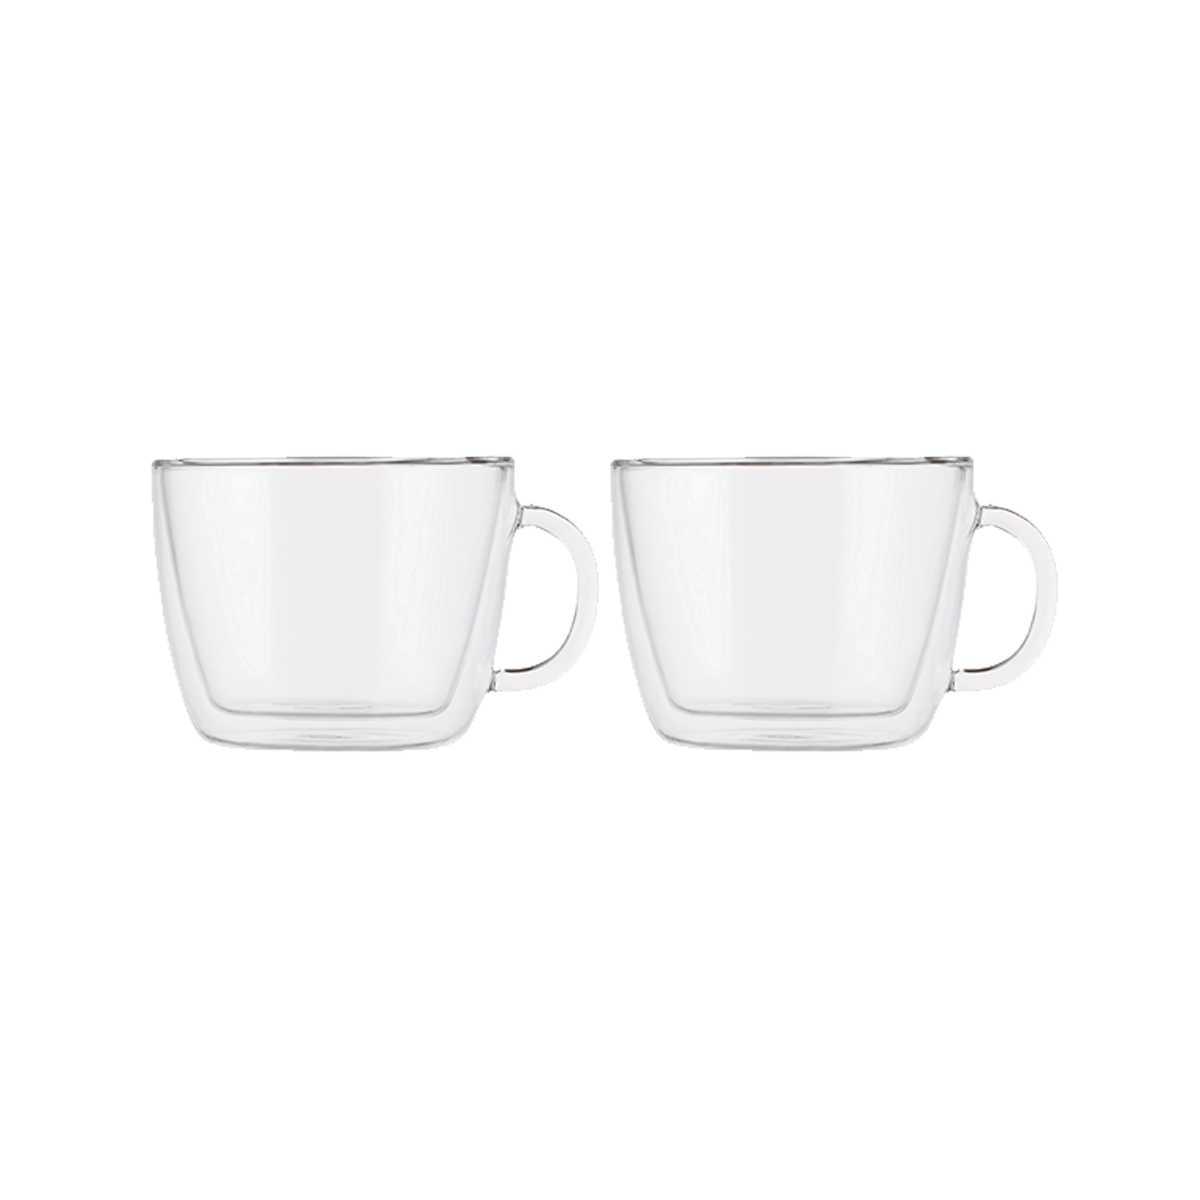 Онлайн каталог PROMENU: Набор чашек для латте 0,45 л, 2 шт Bodum Bistro  (10608-10) Bodum 10608-10